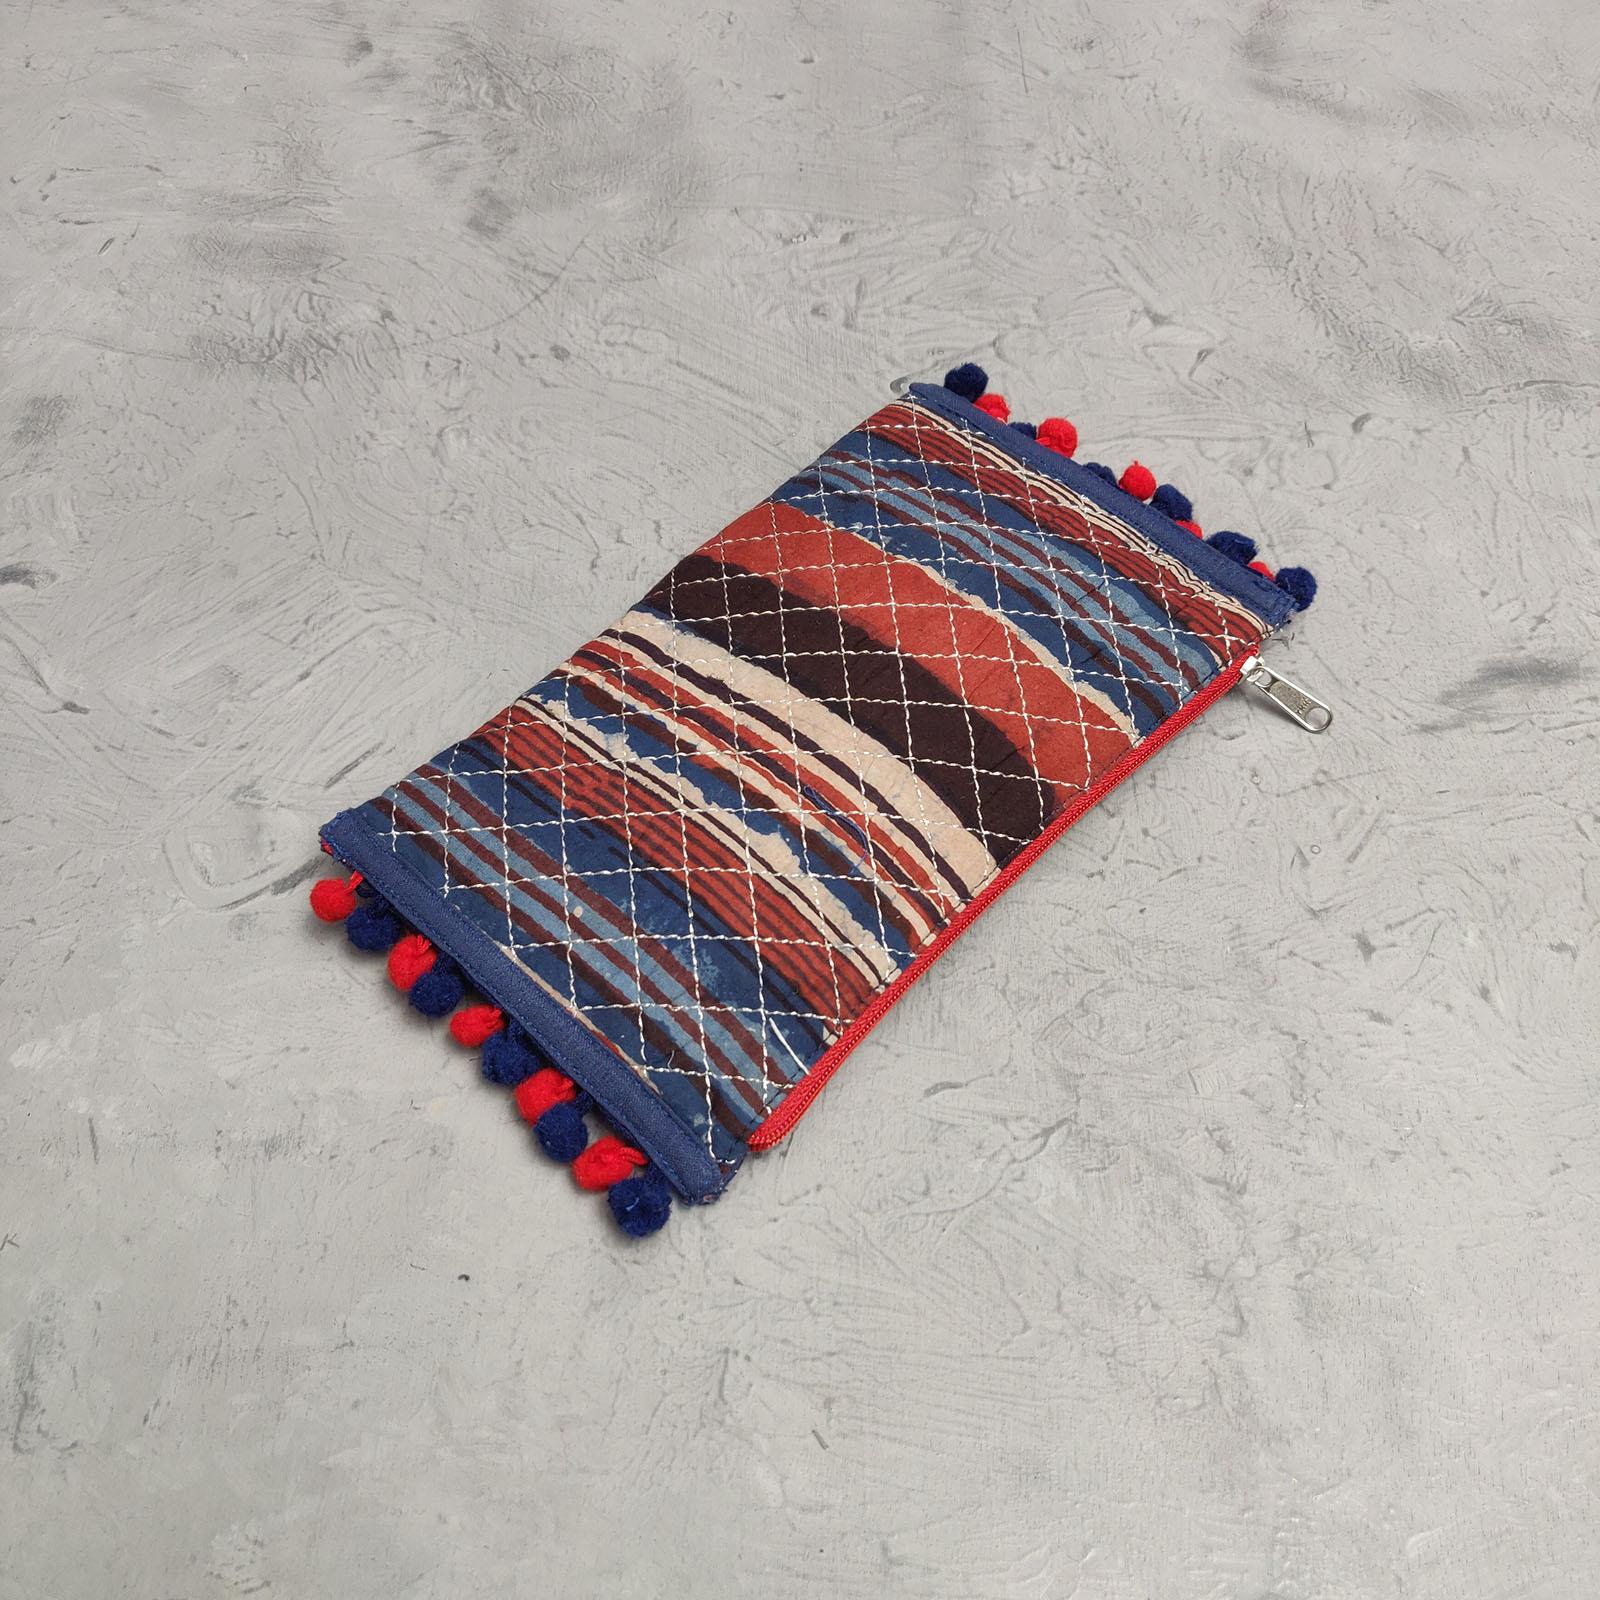 Handblock Printed Braided Wallet AW21